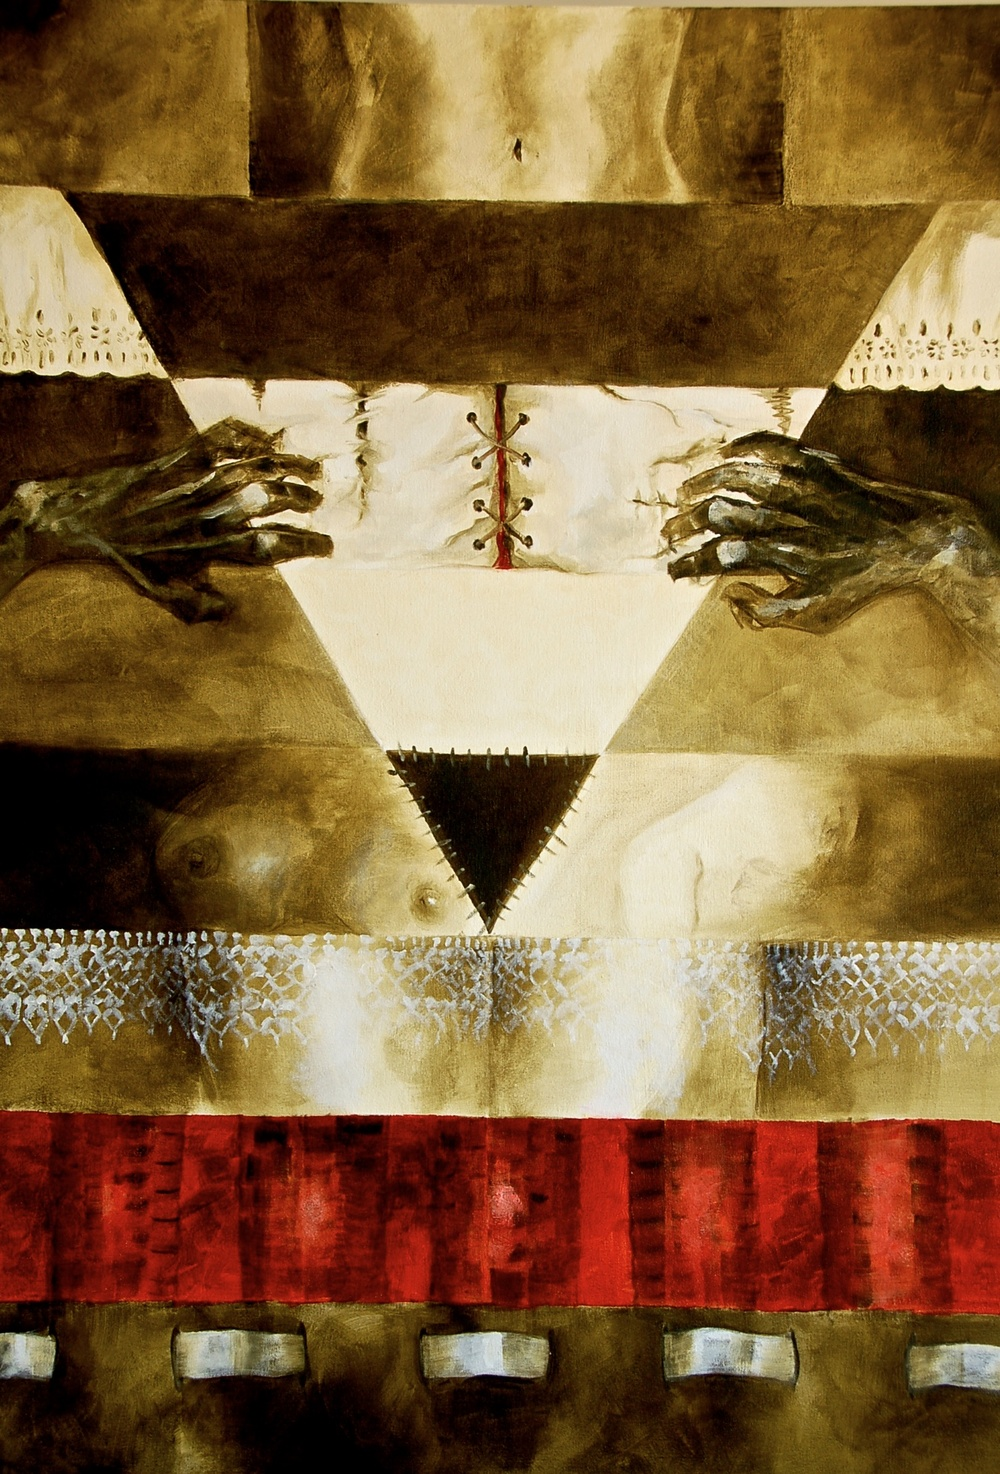 Visceral Oil on canvas 120 x 90 cm 2009